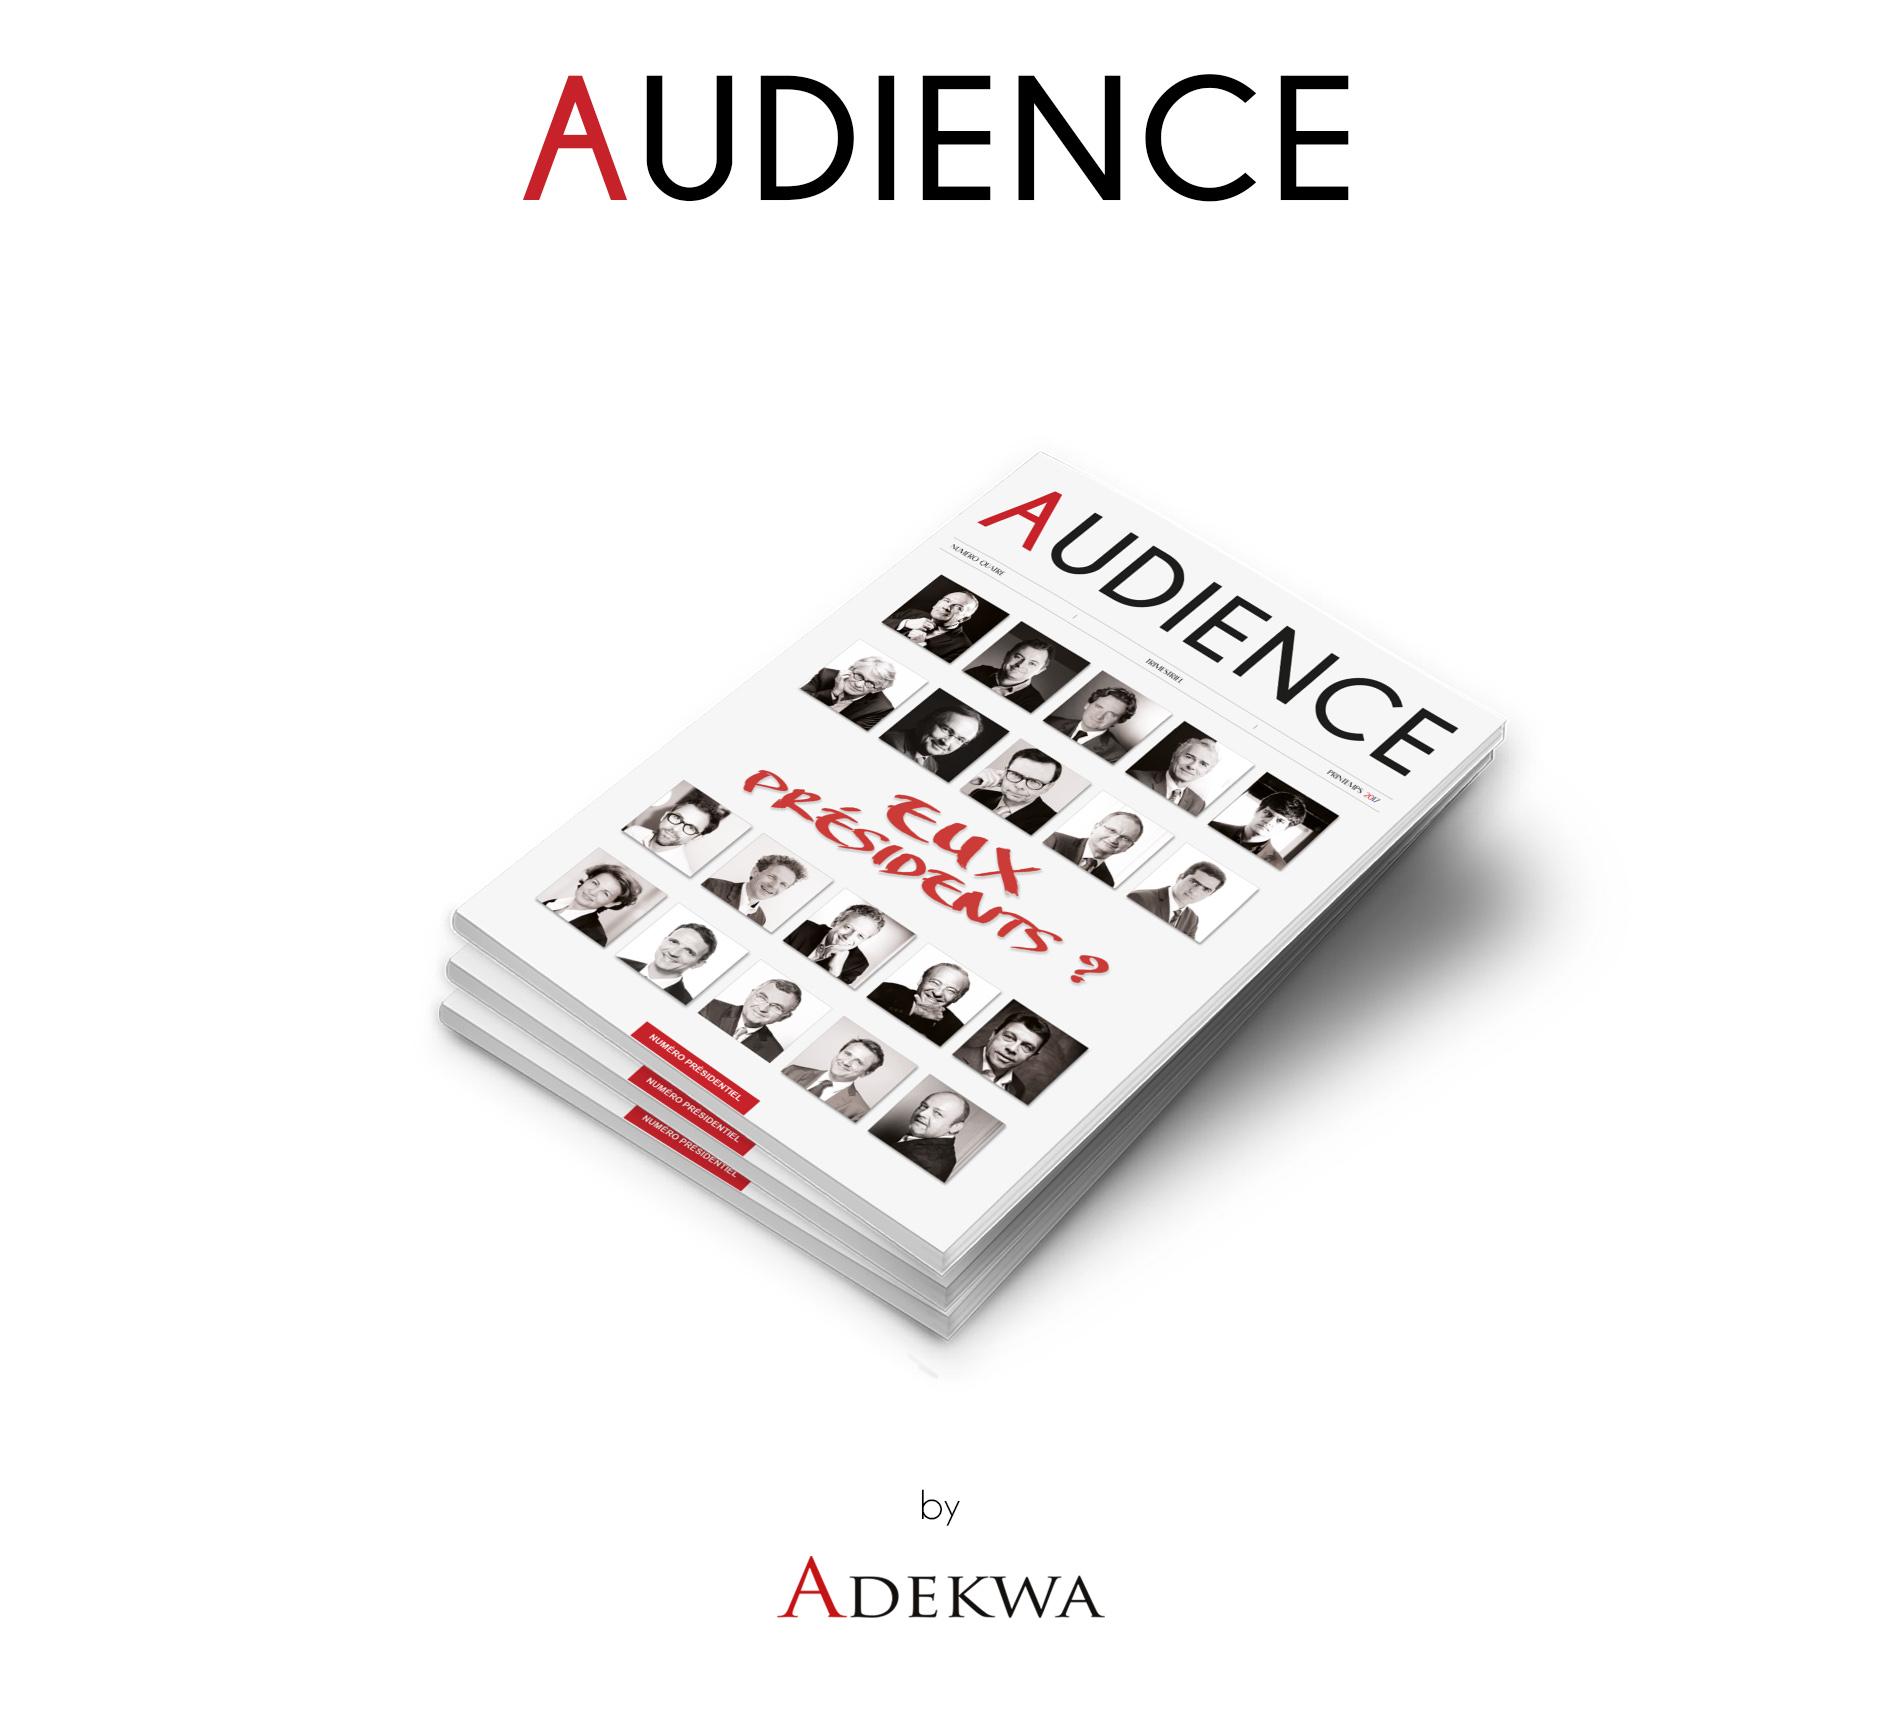 ADEKWA Avocats Lille - Présentation AUDIENCE